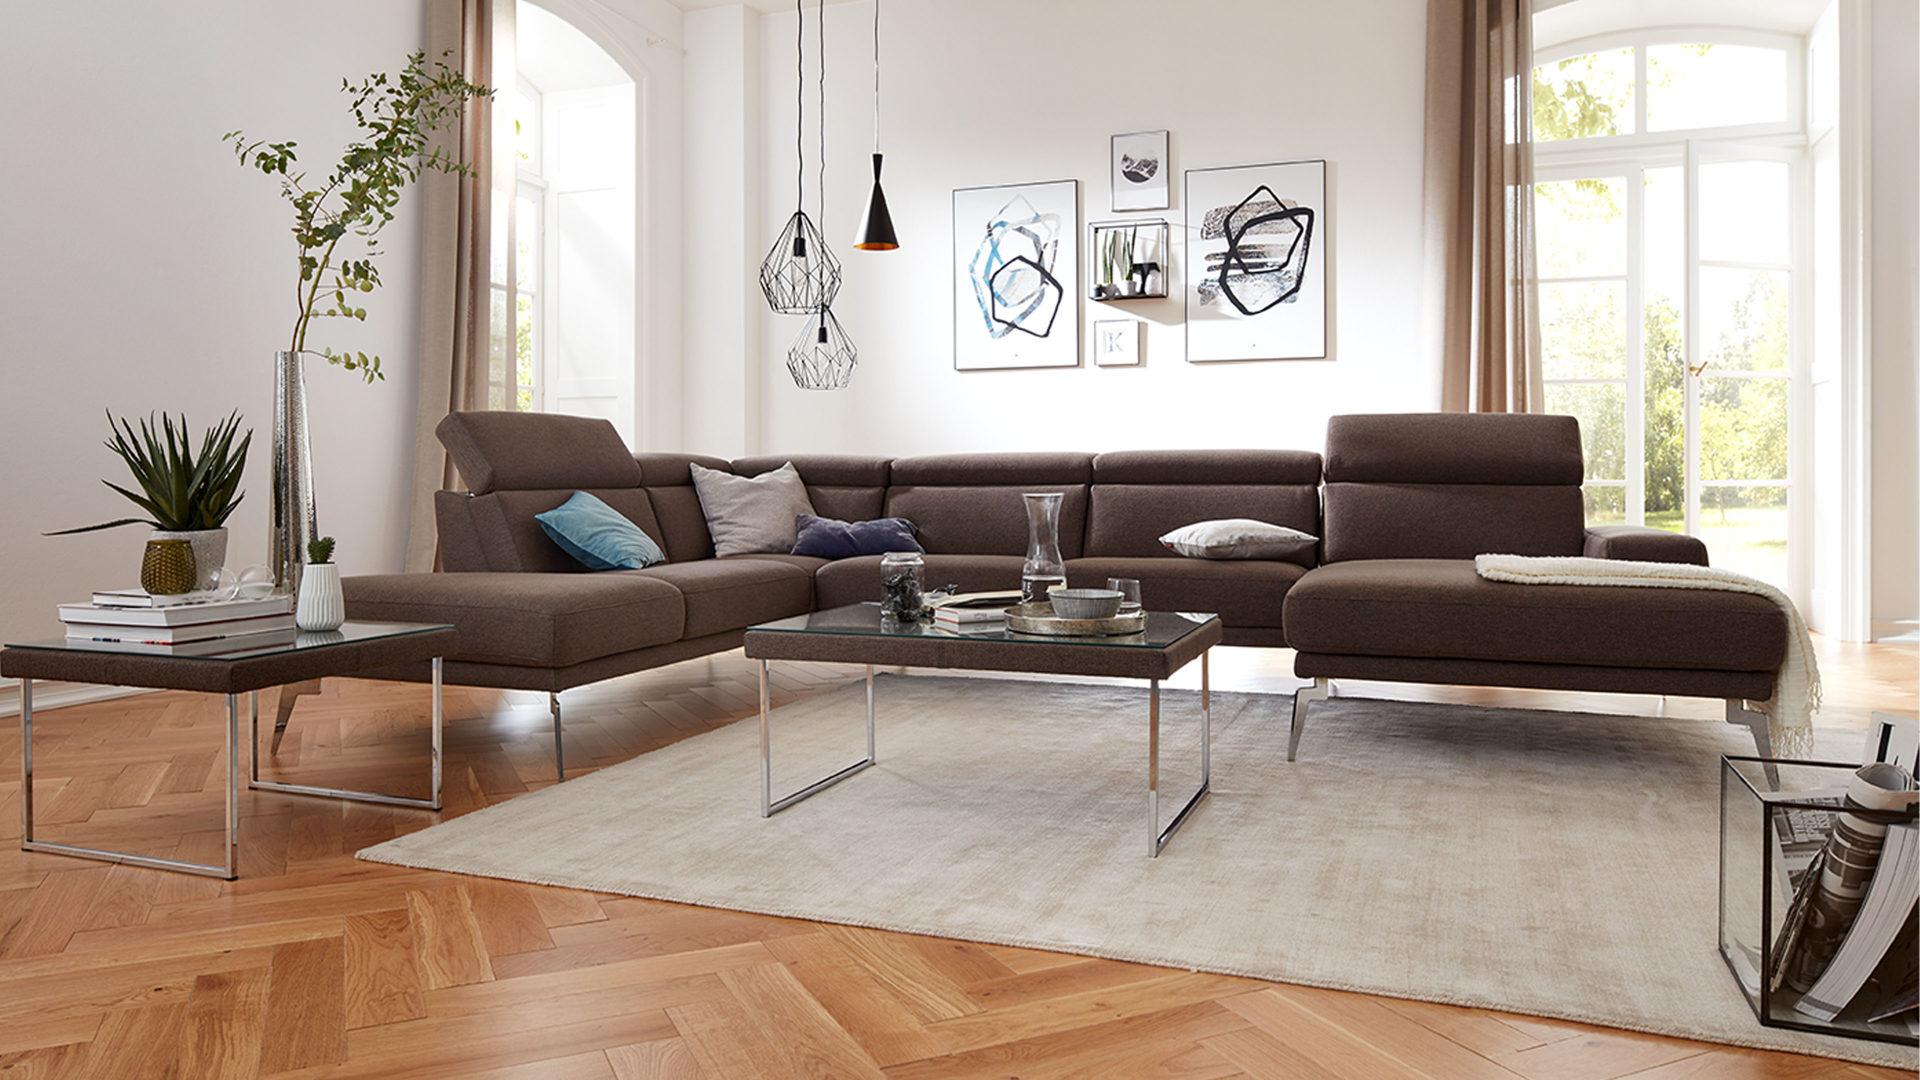 Interliving Sofa Serie 4152 ? Eckko...